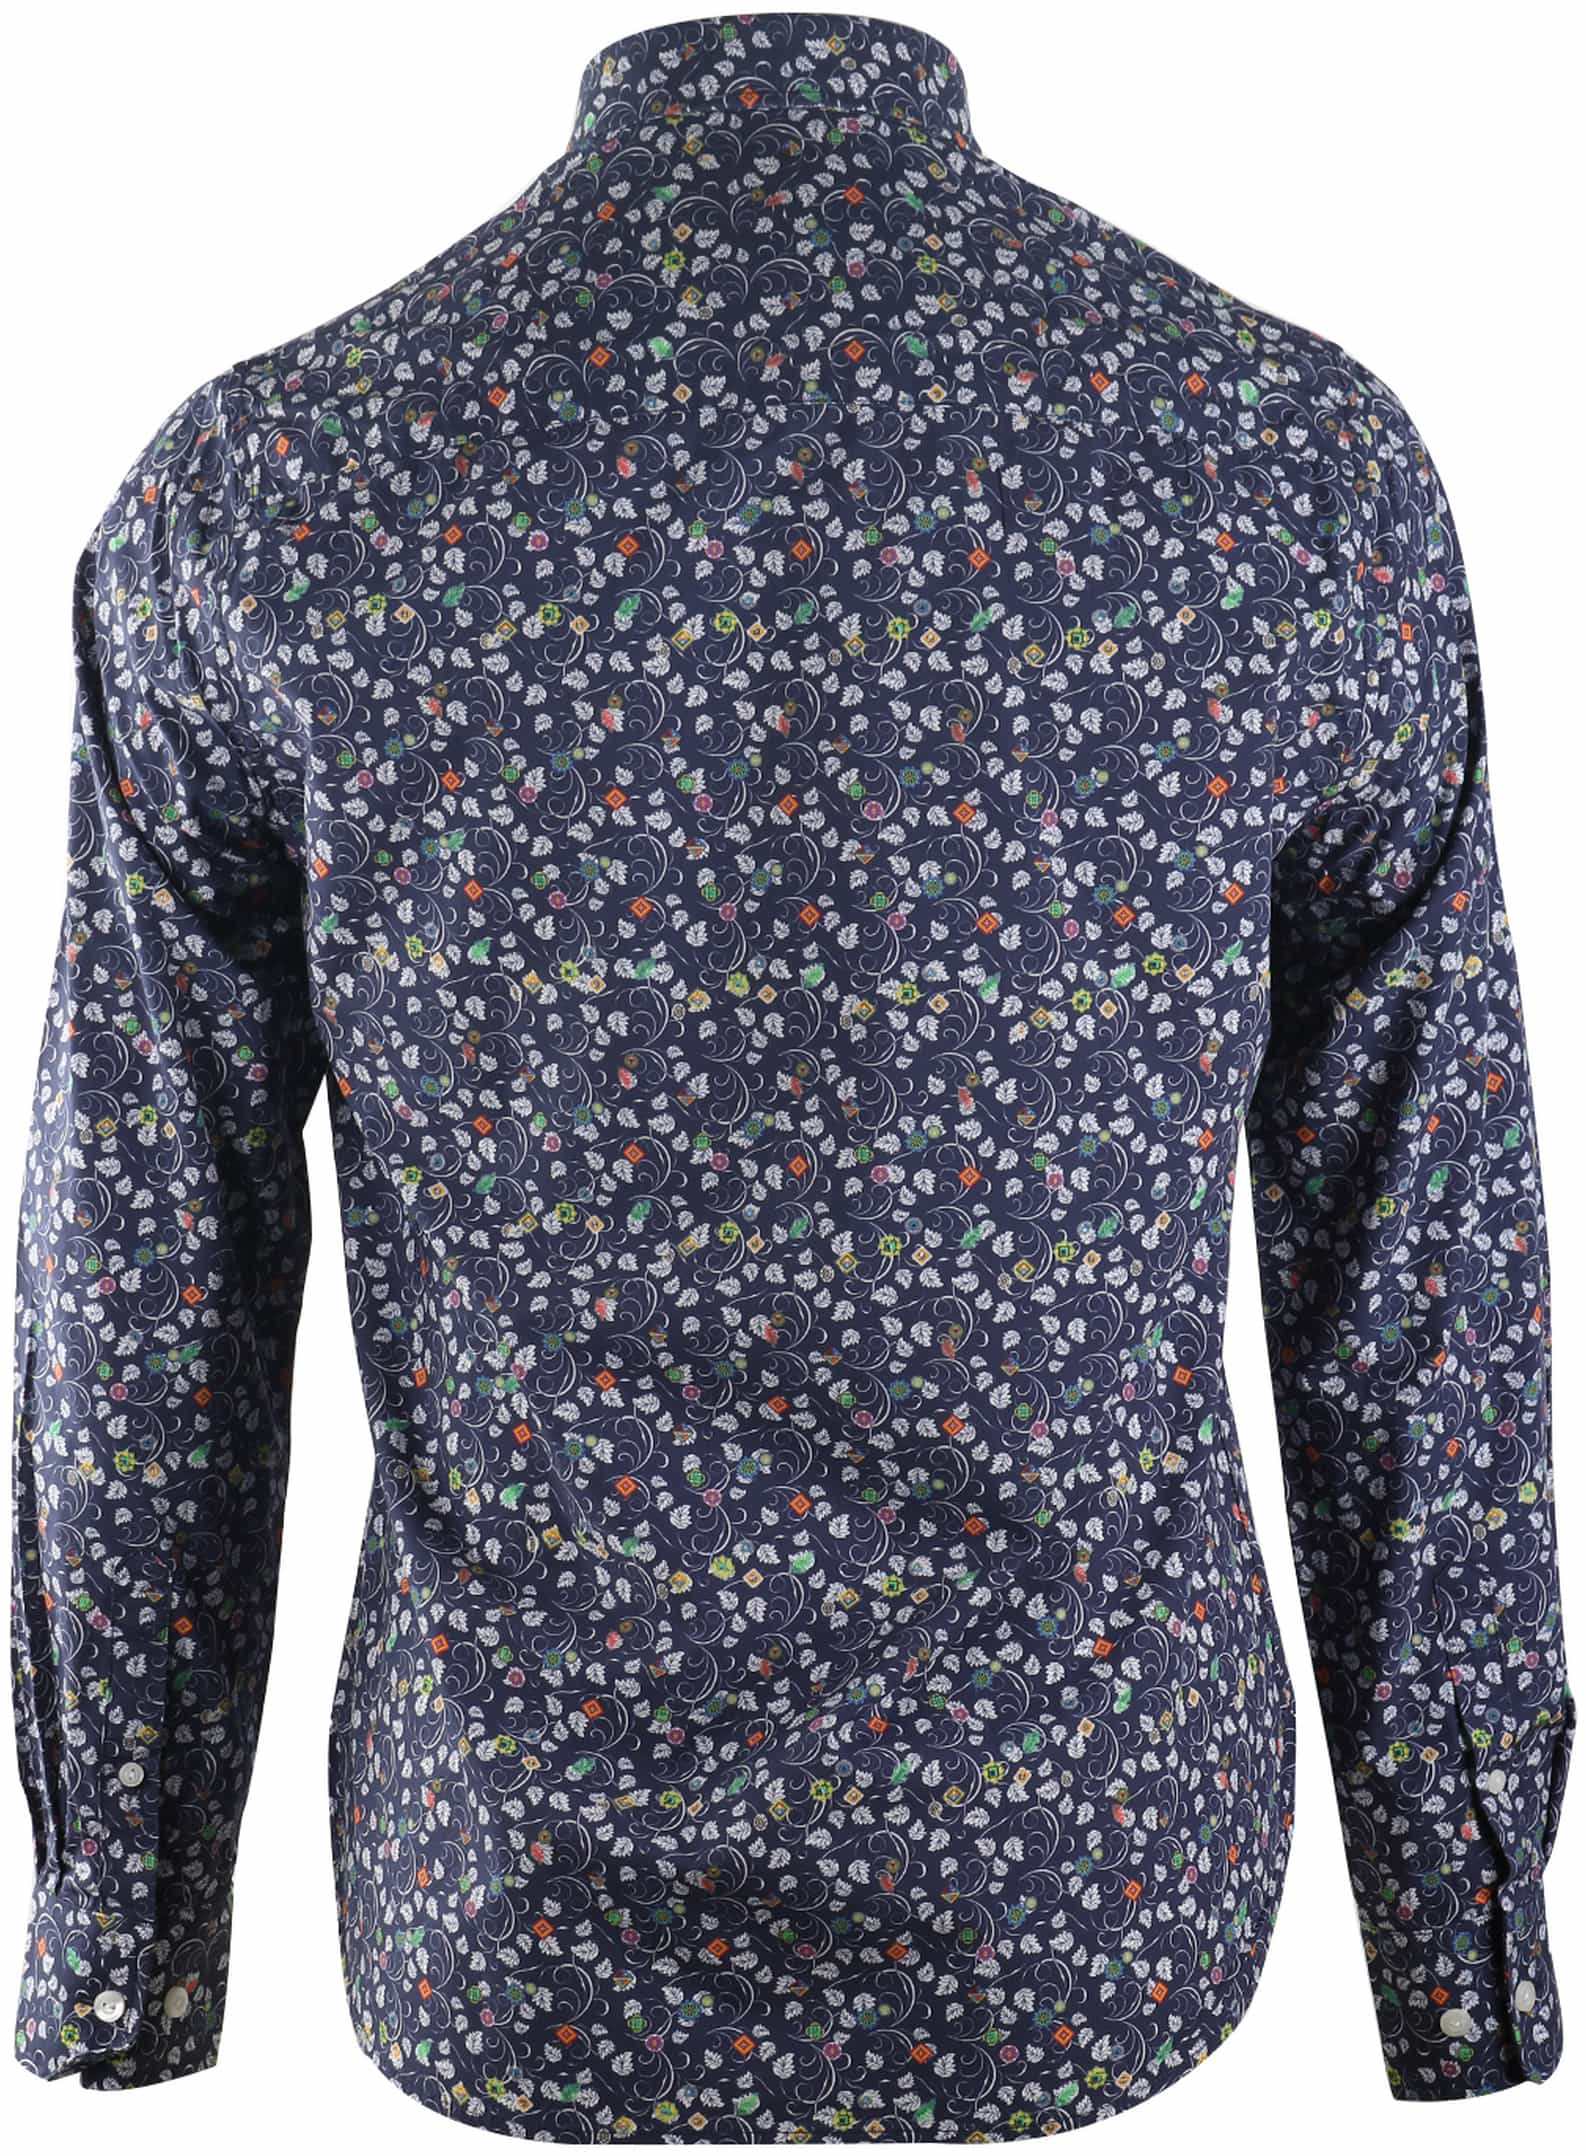 NZA Overhemd Donkerblauw 17AN509 foto 1